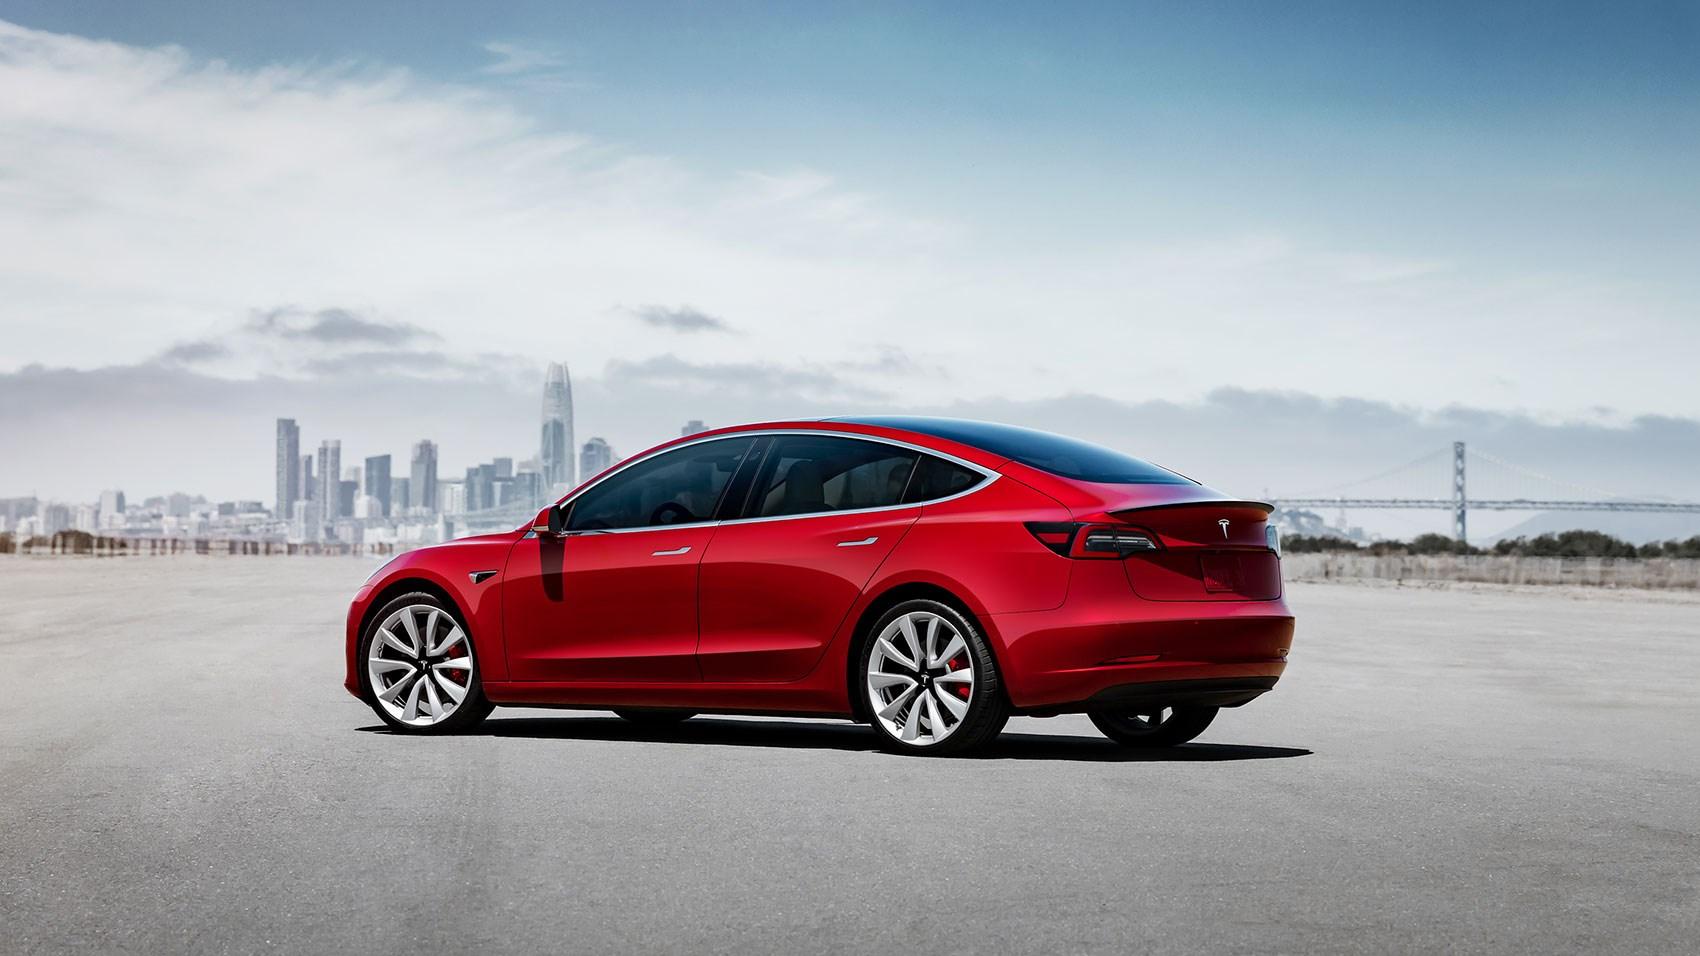 The New Tesla Model 3 Saloon Lease Deal | Yorkshire Fleet